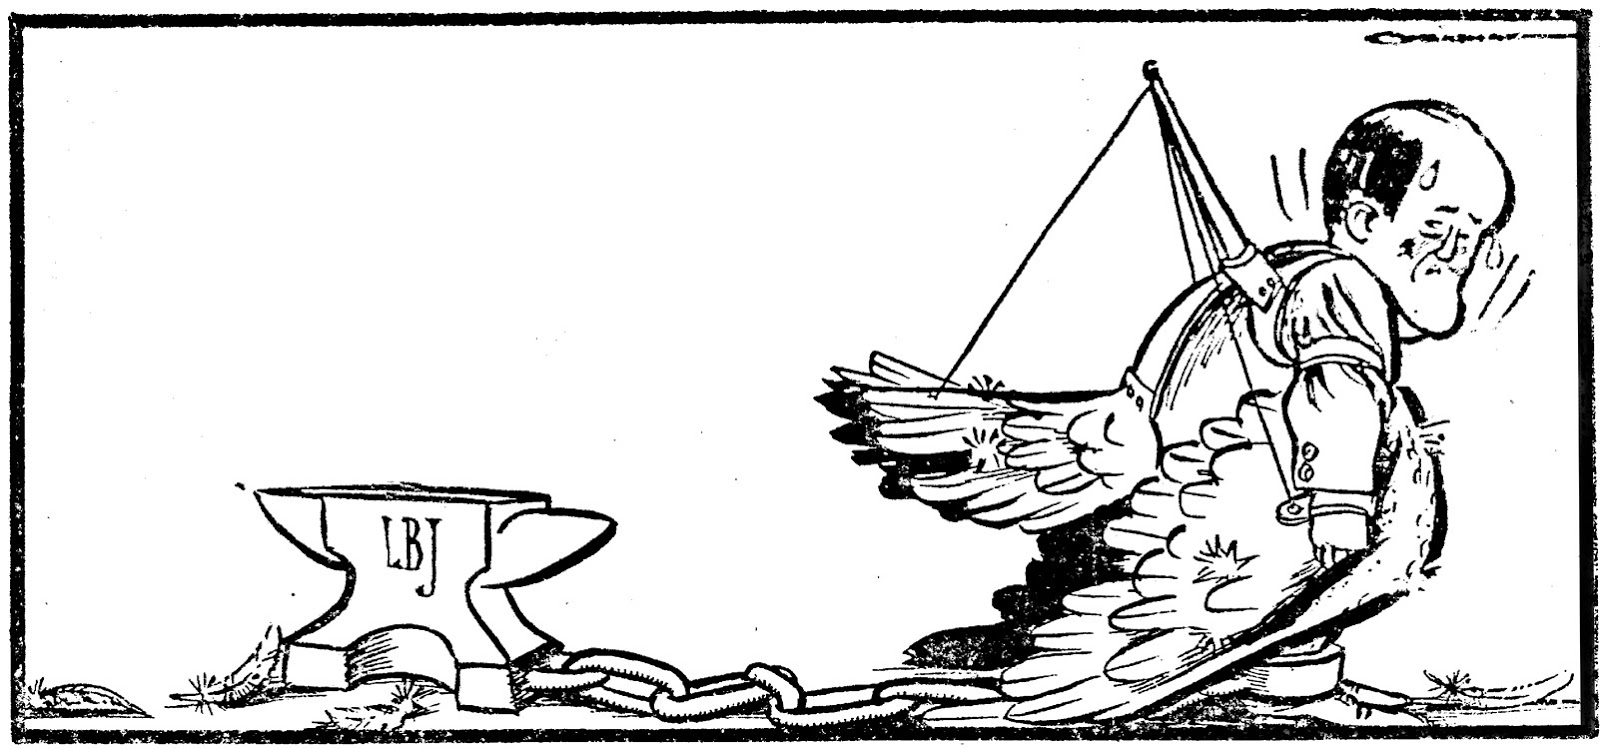 Berge's Cartoon Blog: October 2018